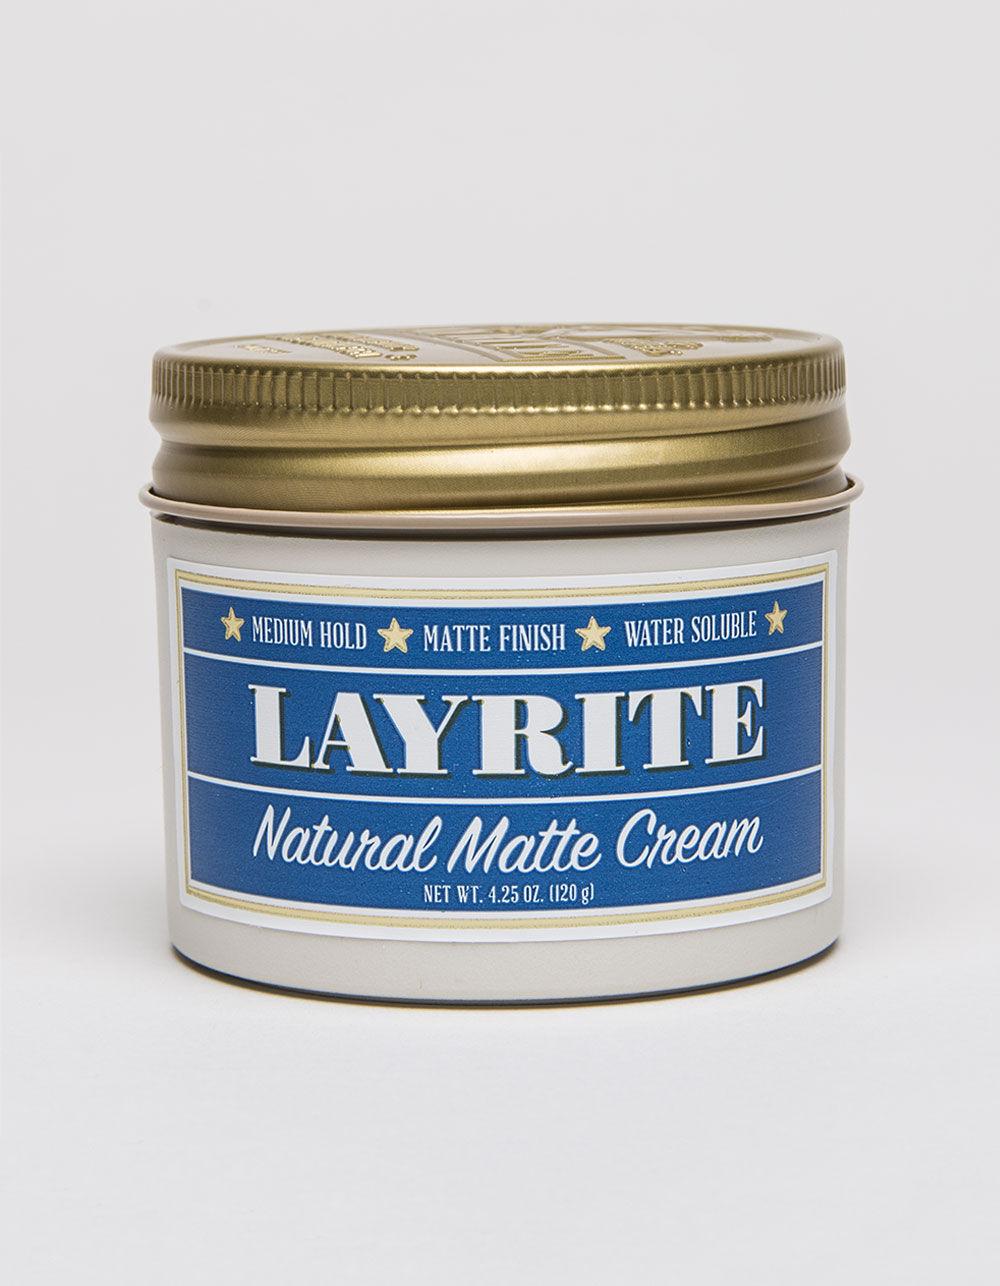 LAYRITE Natural Matte Cream (4.25oz)